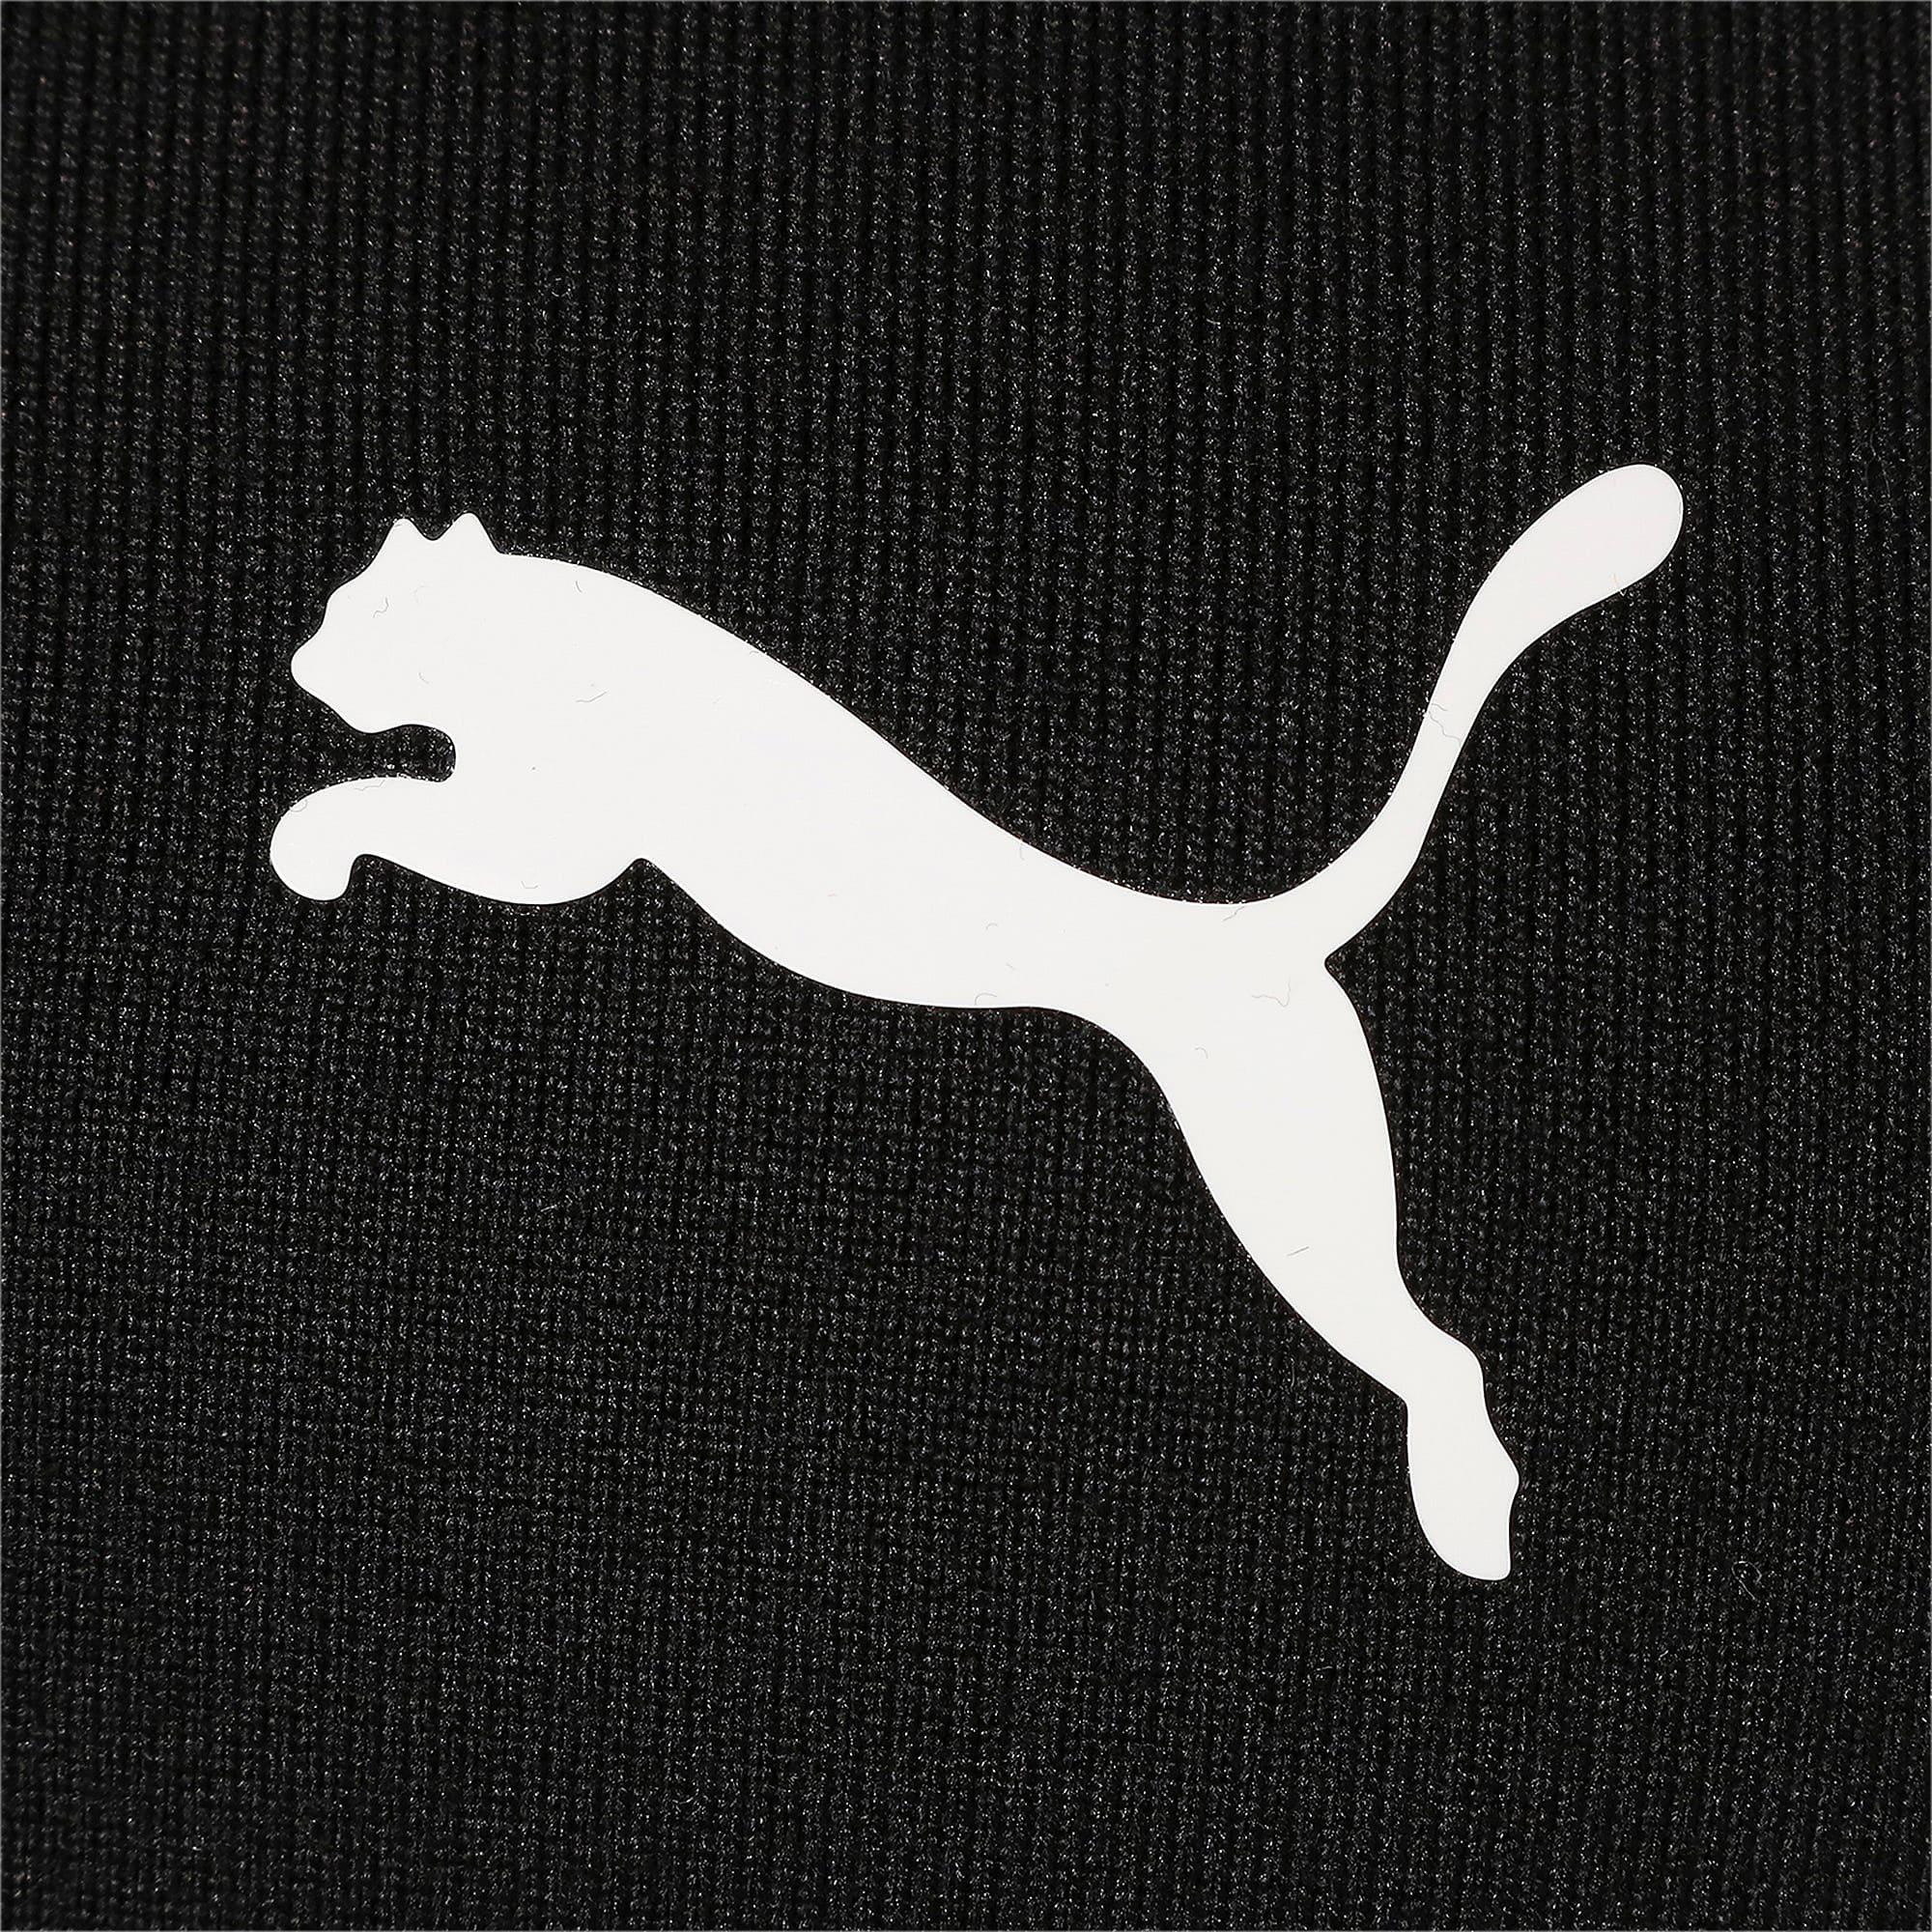 Thumbnail 7 of スタジオ SS メッシュ ウィメンズ トレーニング Tシャツ 半袖, Puma Black, medium-JPN